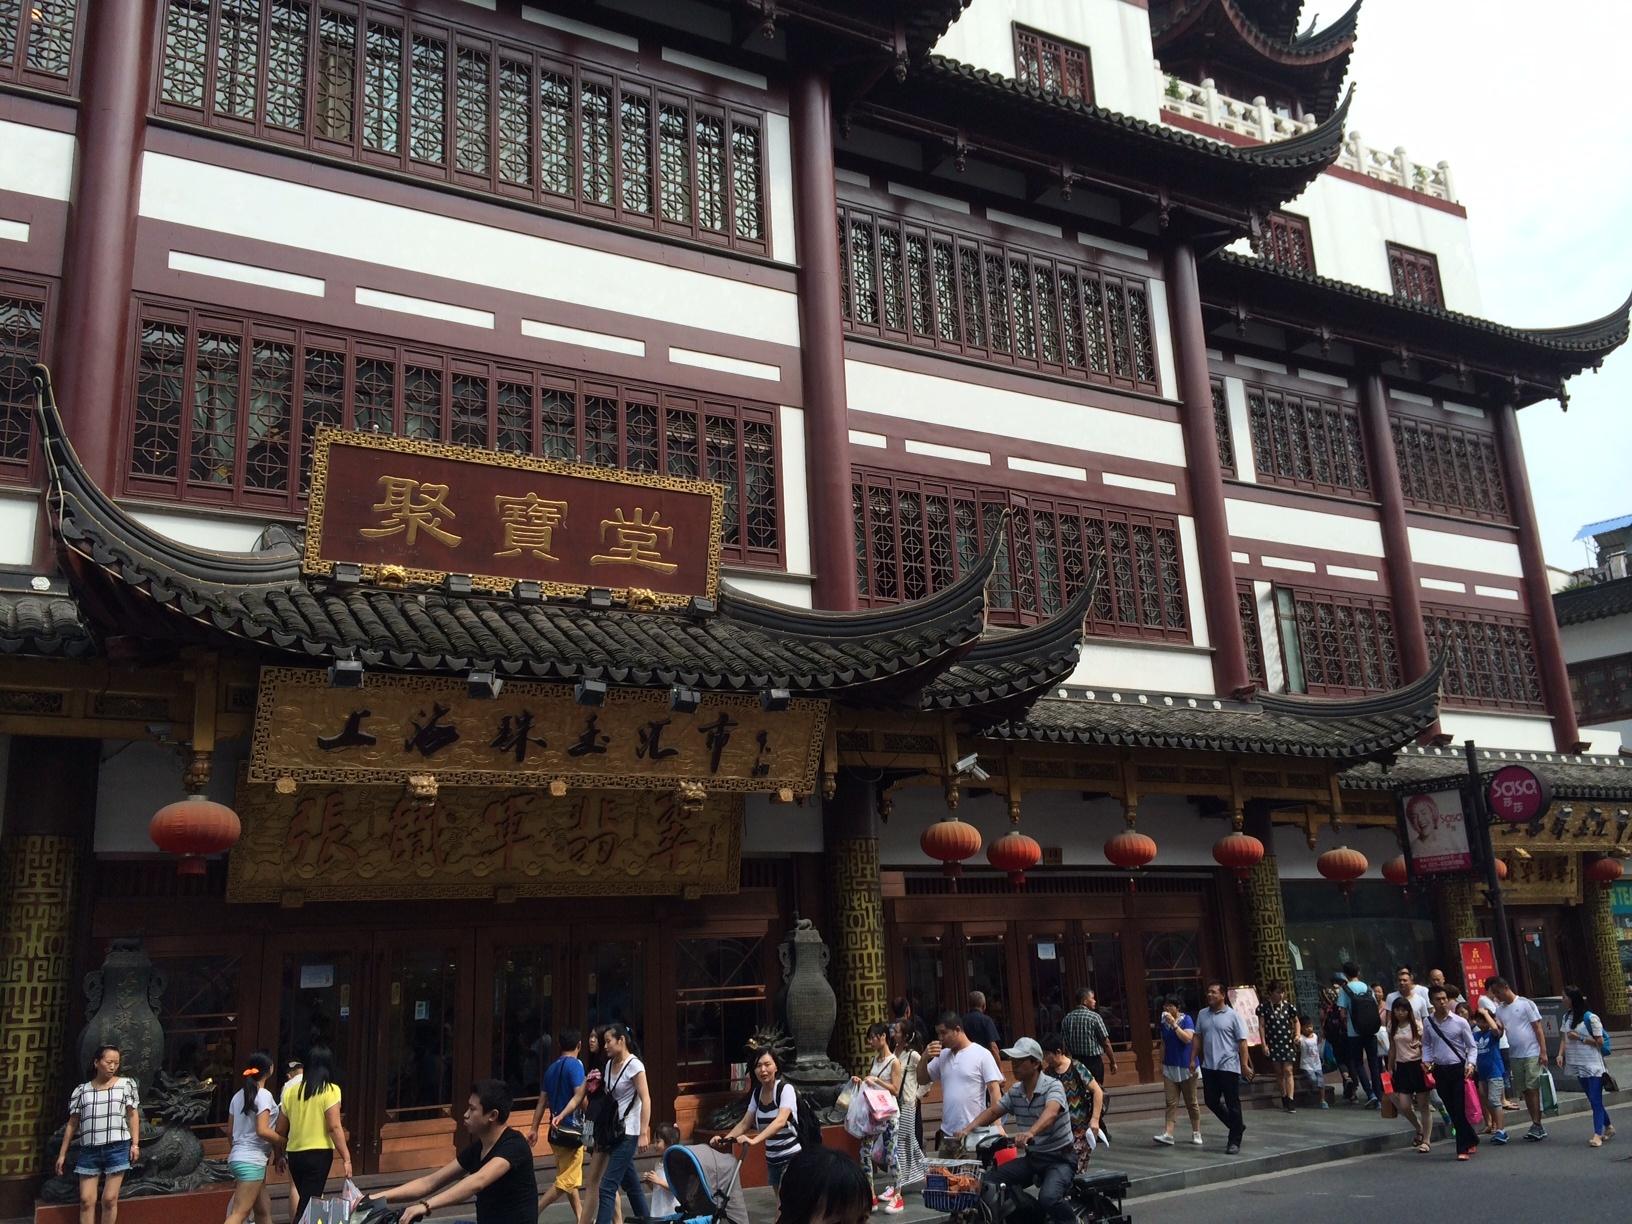 CAPAStudyAbroad_ShanghaiWalksPost_-_Historic_Yu_Garden_Shopping_Area_Old_City